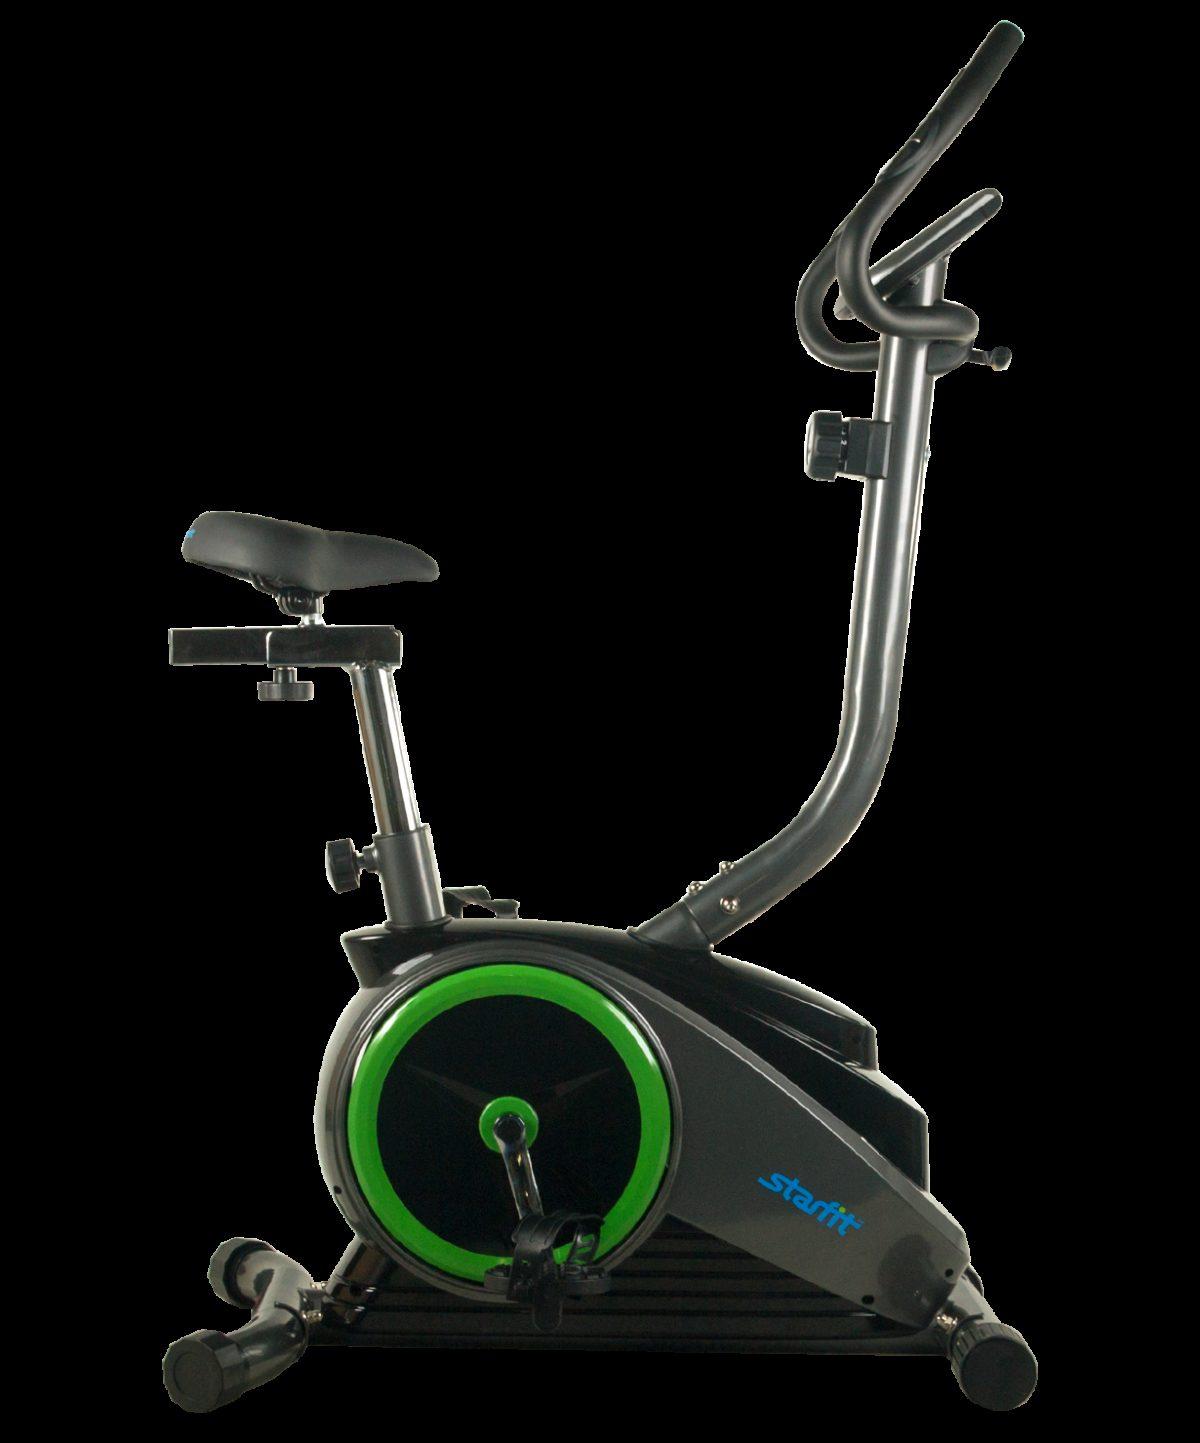 STARFIT Carrera велотренажер магнитный - 3